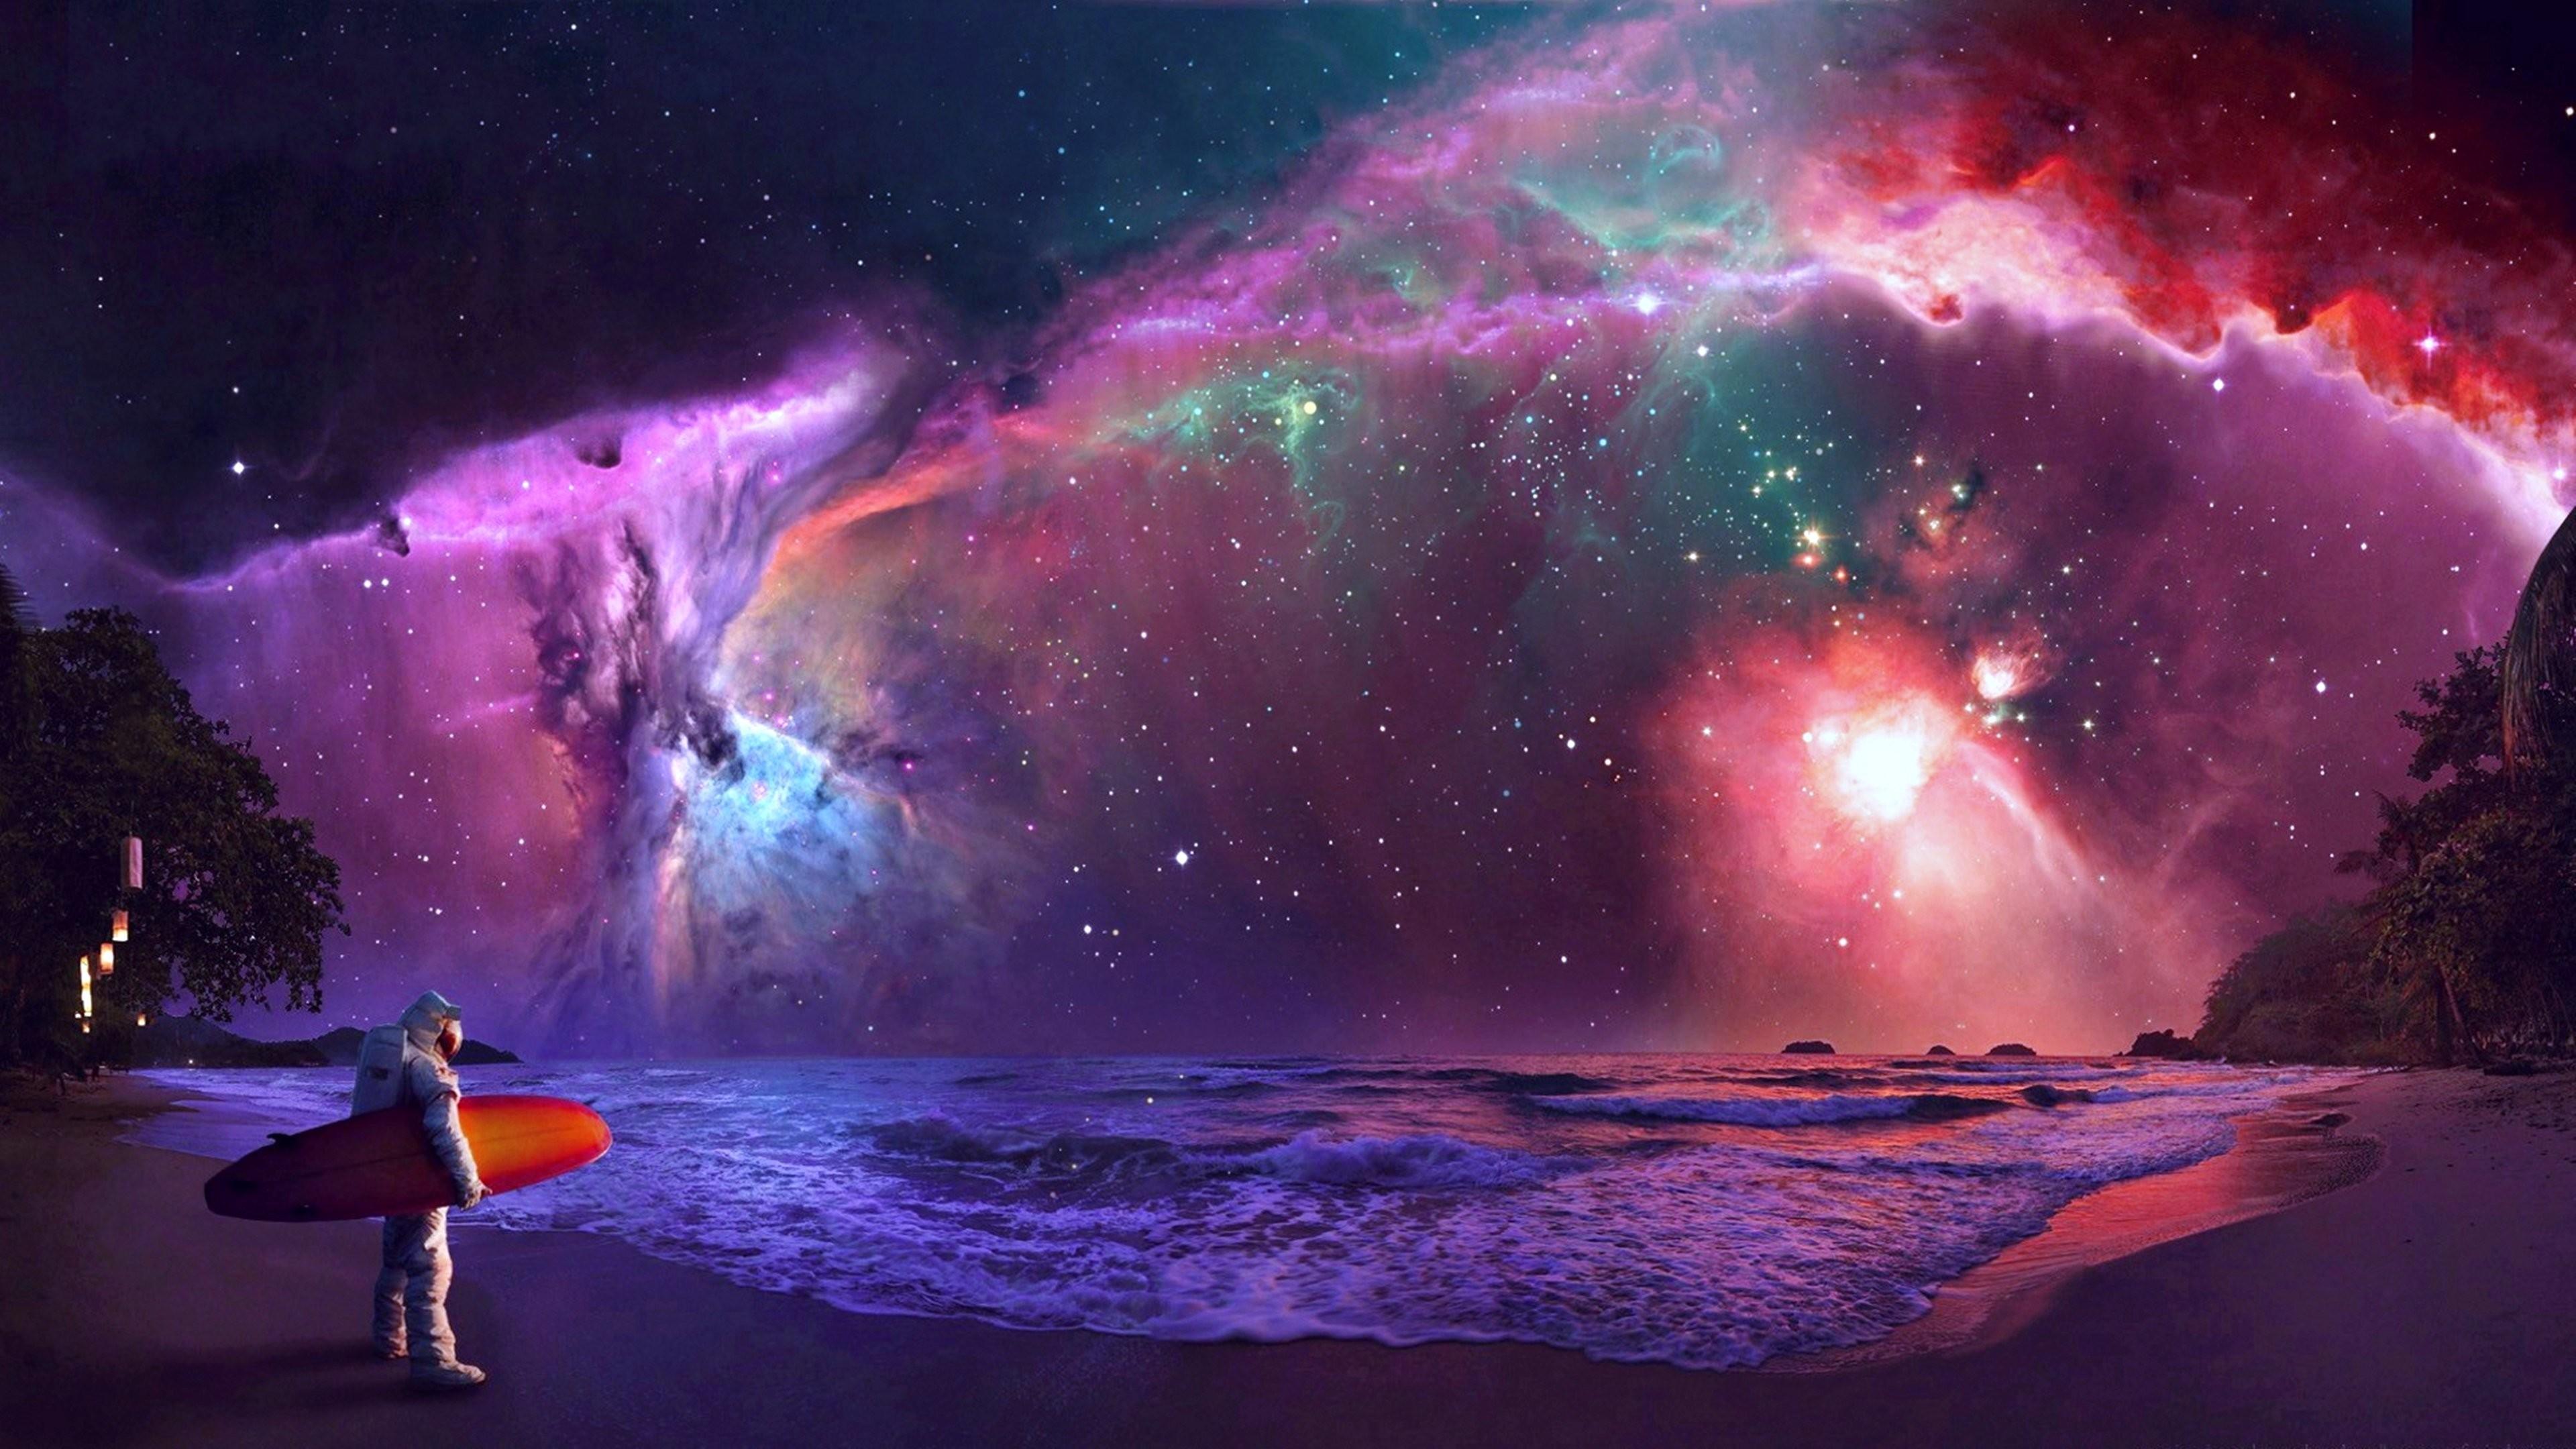 Nebula galaxy stars fantasy magical space suns Planets wallpaper |  | 621444 | WallpaperUP